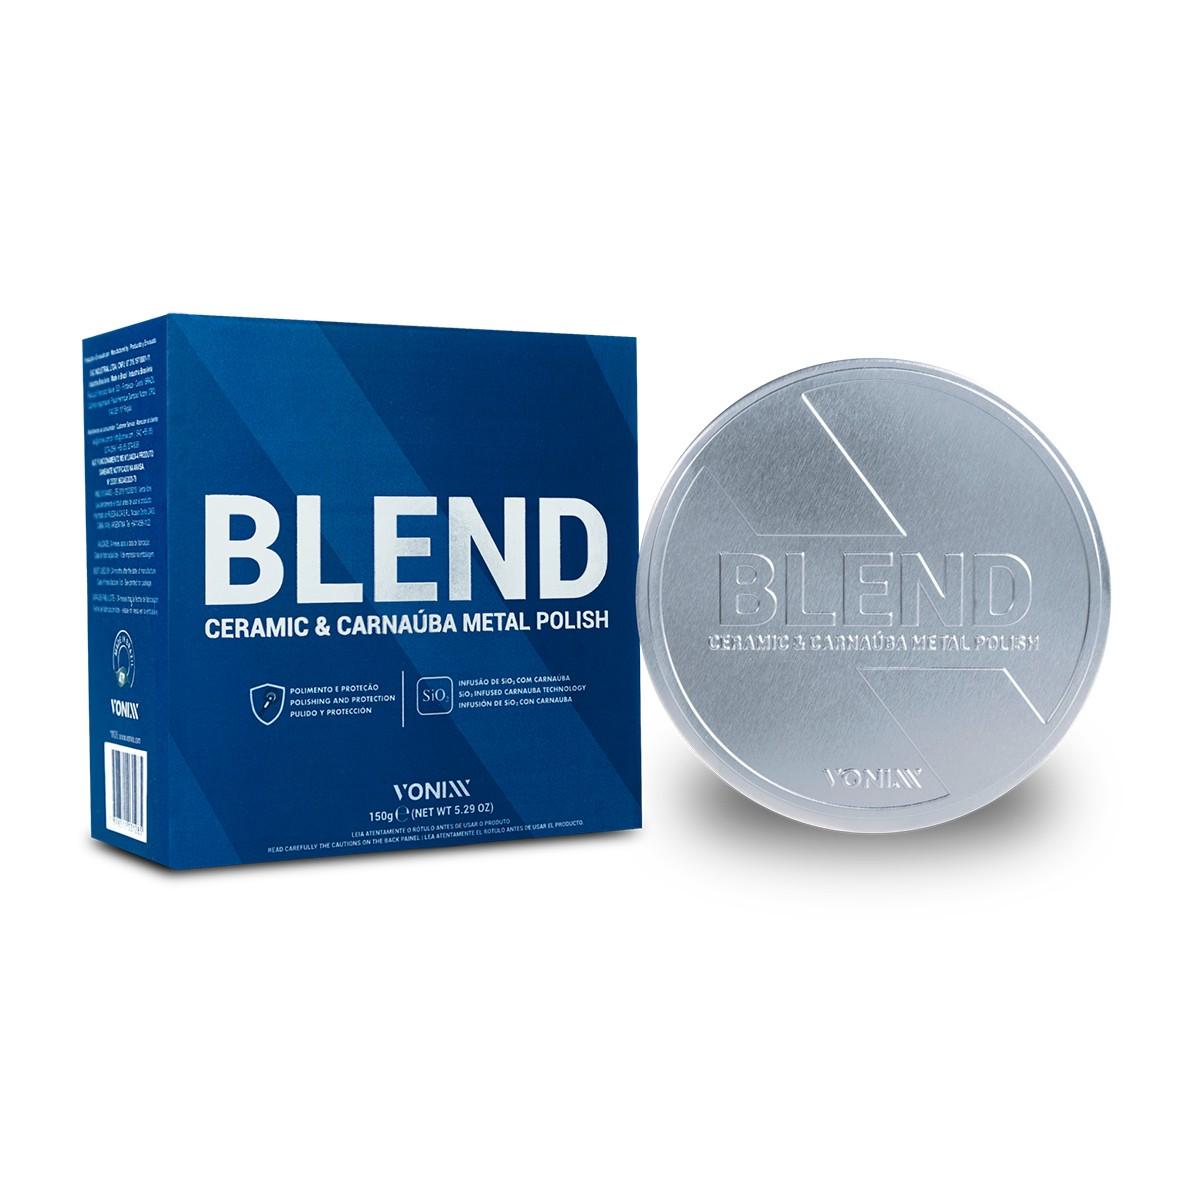 Blend Ceramic & Carnaúba Metal Polish 150g - Vonixx